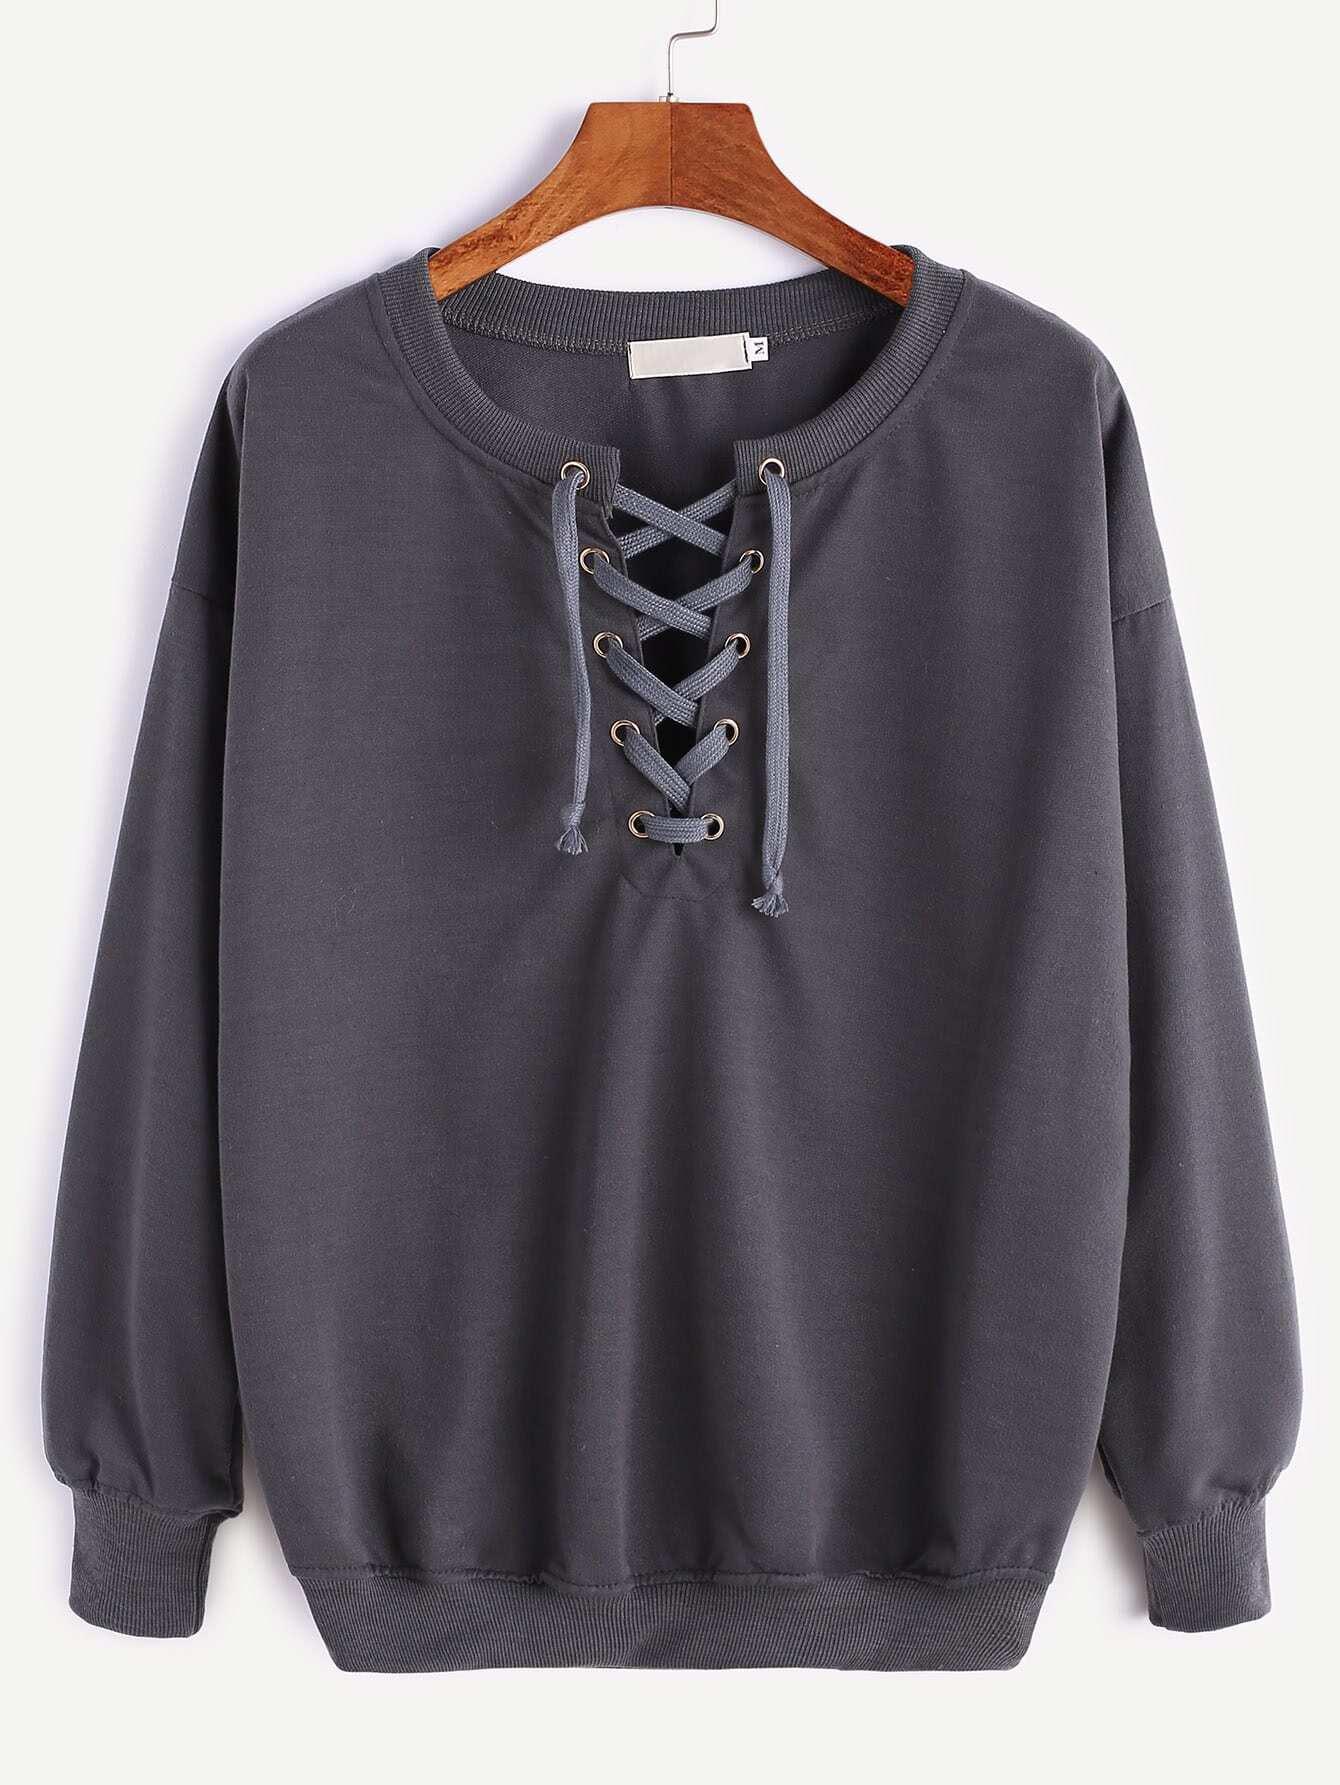 Dark Grey Ribbed Trim Drop Shoulder Lace Up Sweatshirt sweatshirt161124302